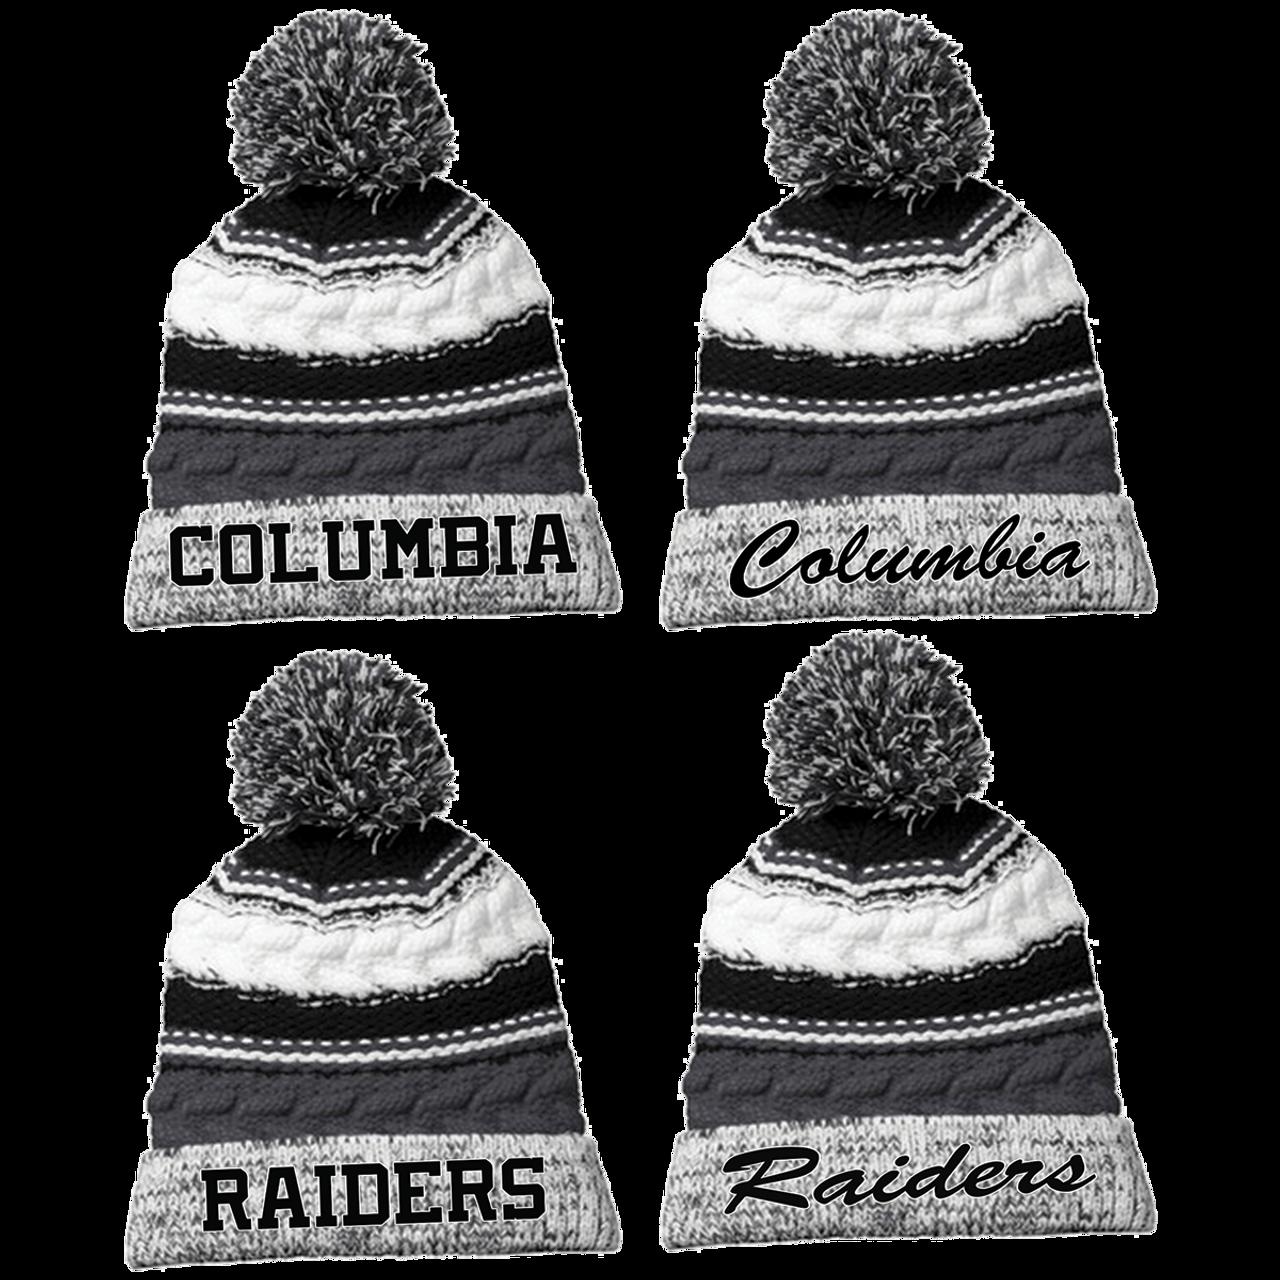 5391207c7b9a8 Columbia Raiders Pom Pom Beanie (RY200 RY202 RY204 RY206) - RycoSports